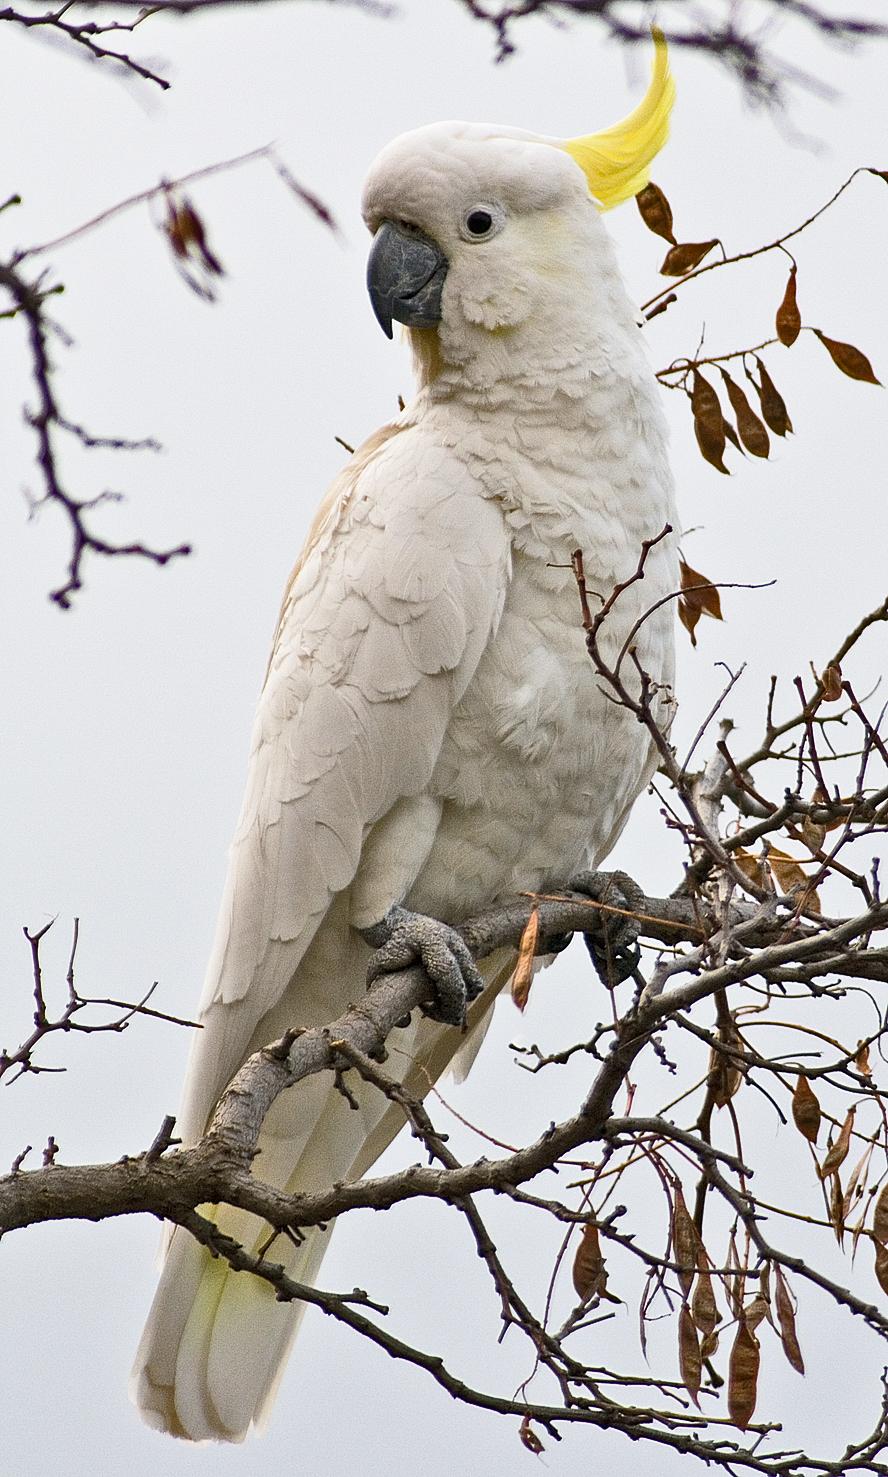 Blue eyed triton cockatoo - photo#7